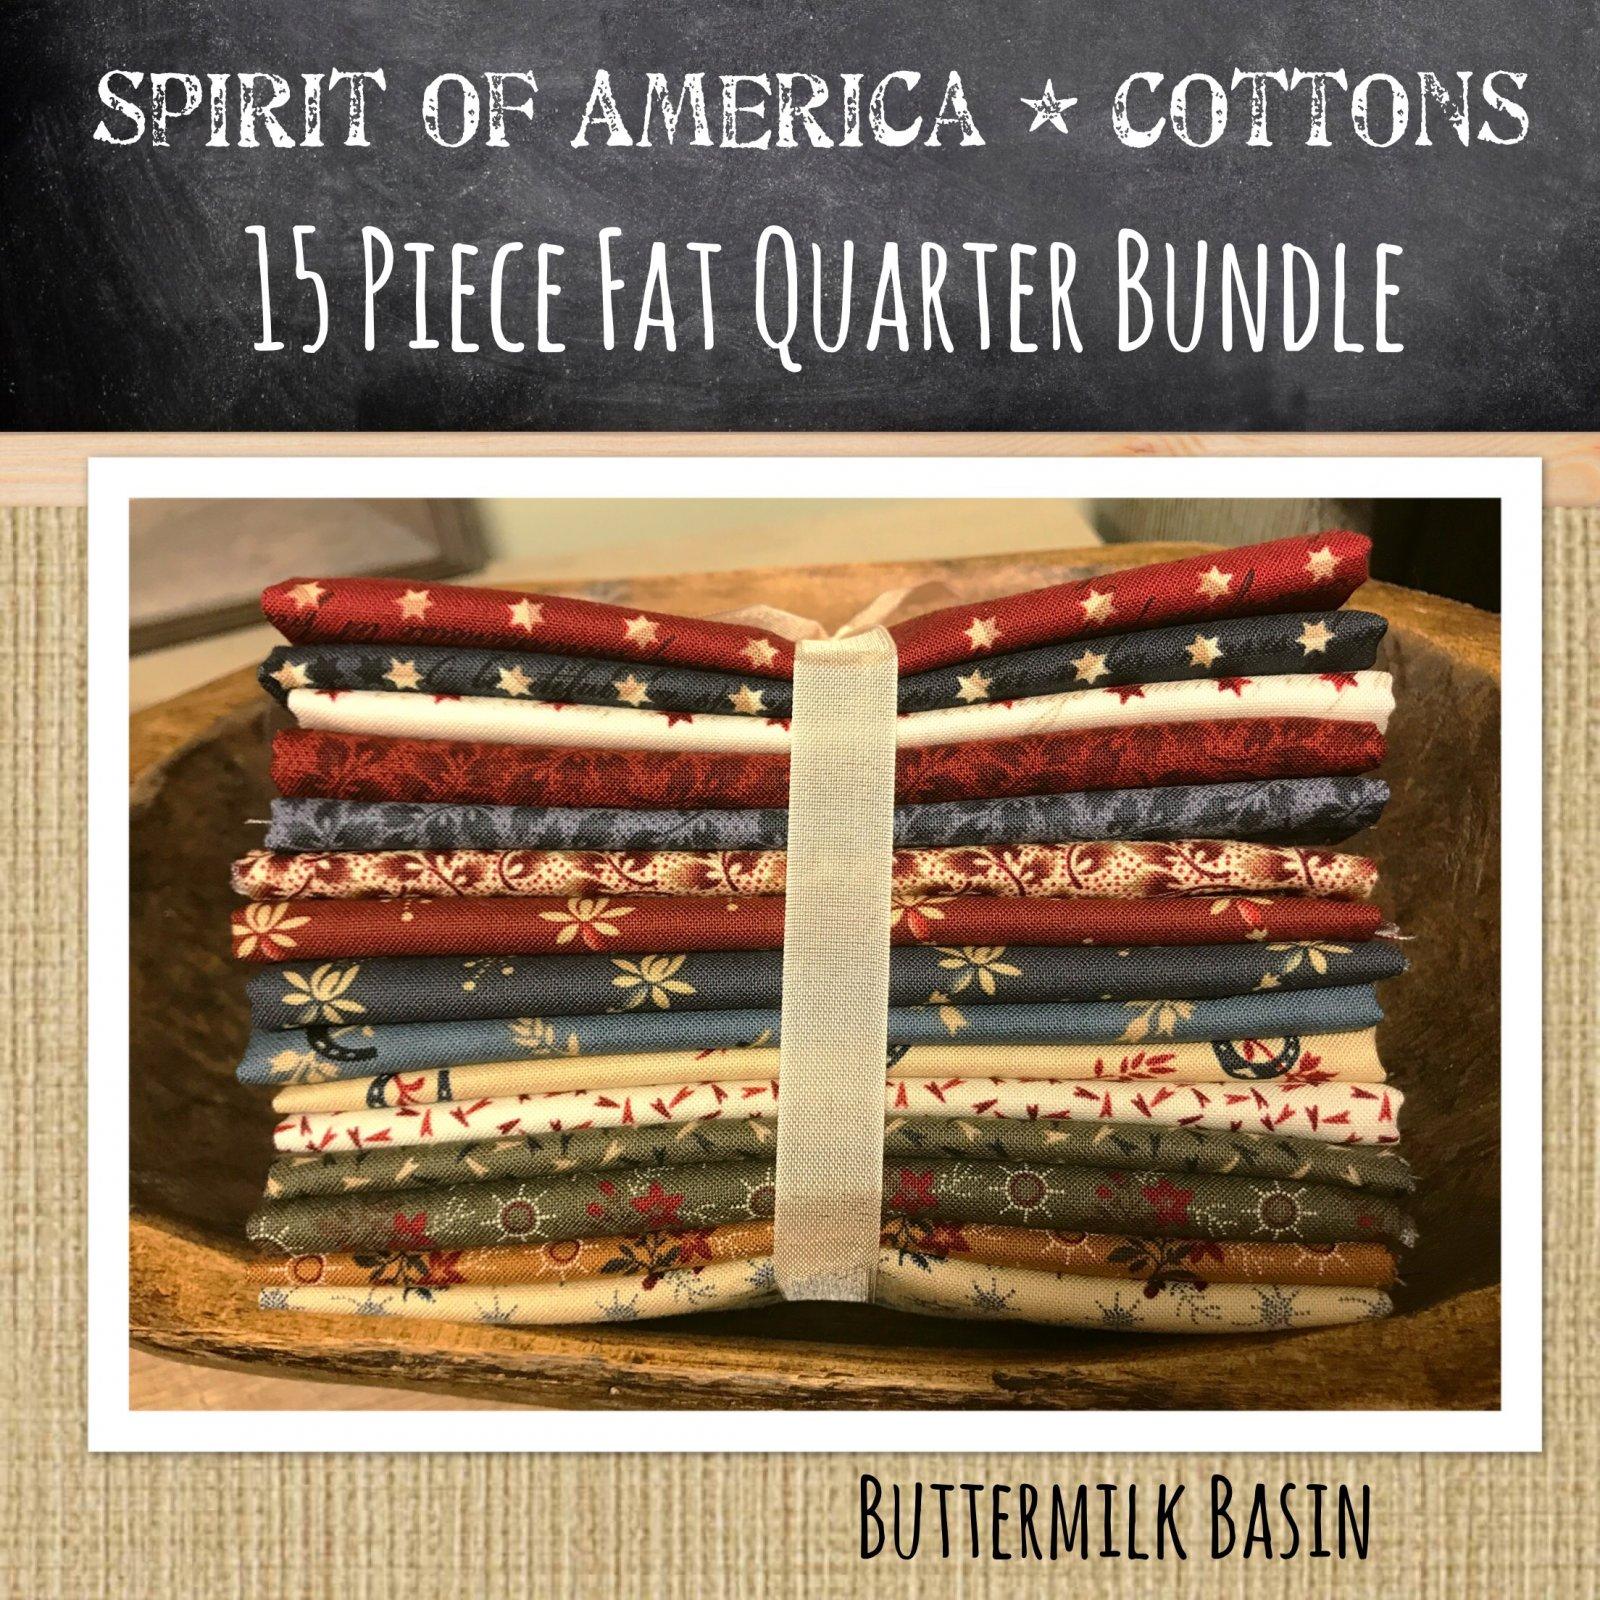 Spirit of America 15 Piece Fat Quarter Bundle